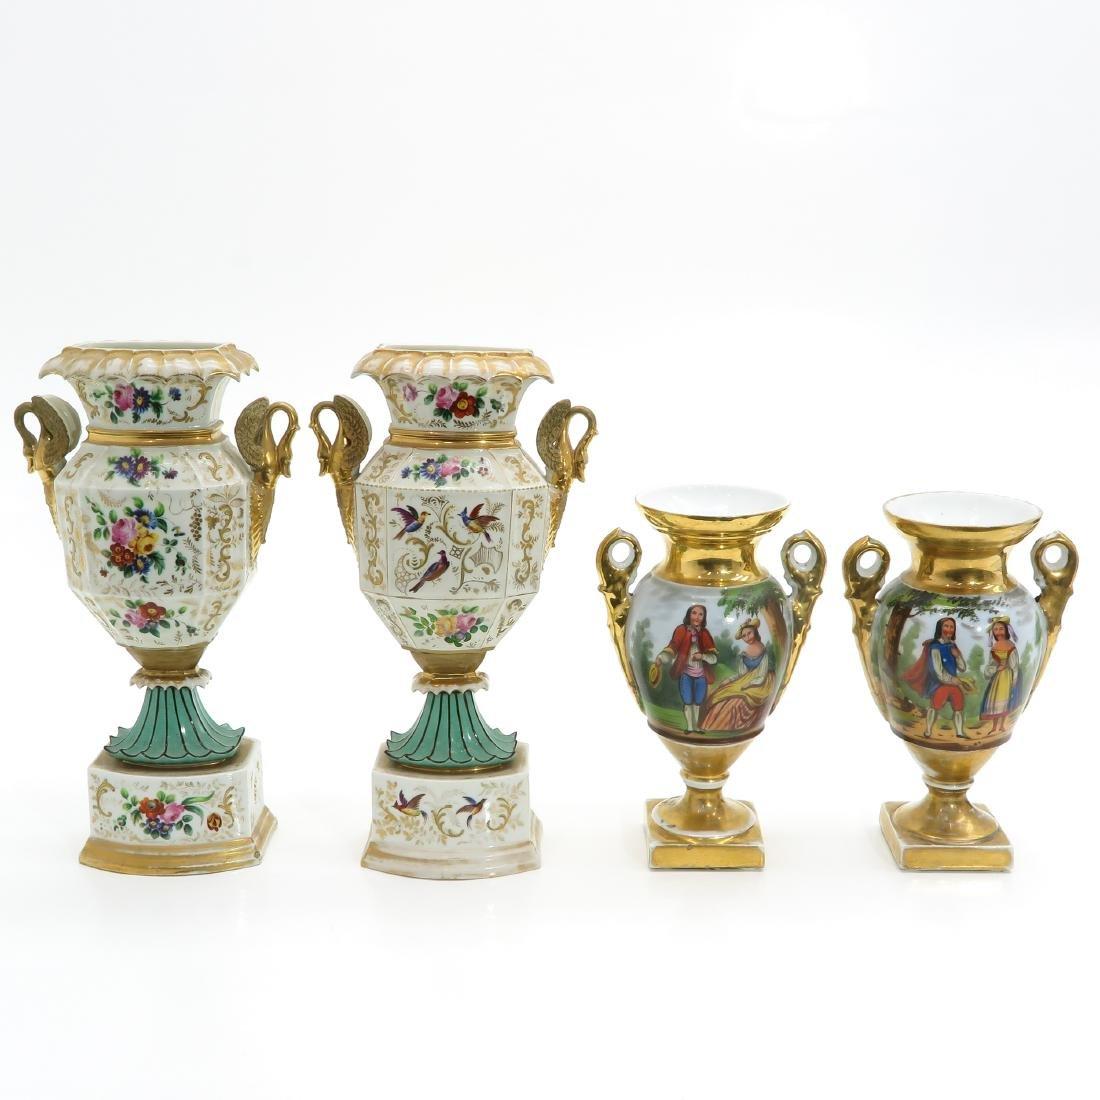 Two Pair of 19th Century European Porcelain Urns